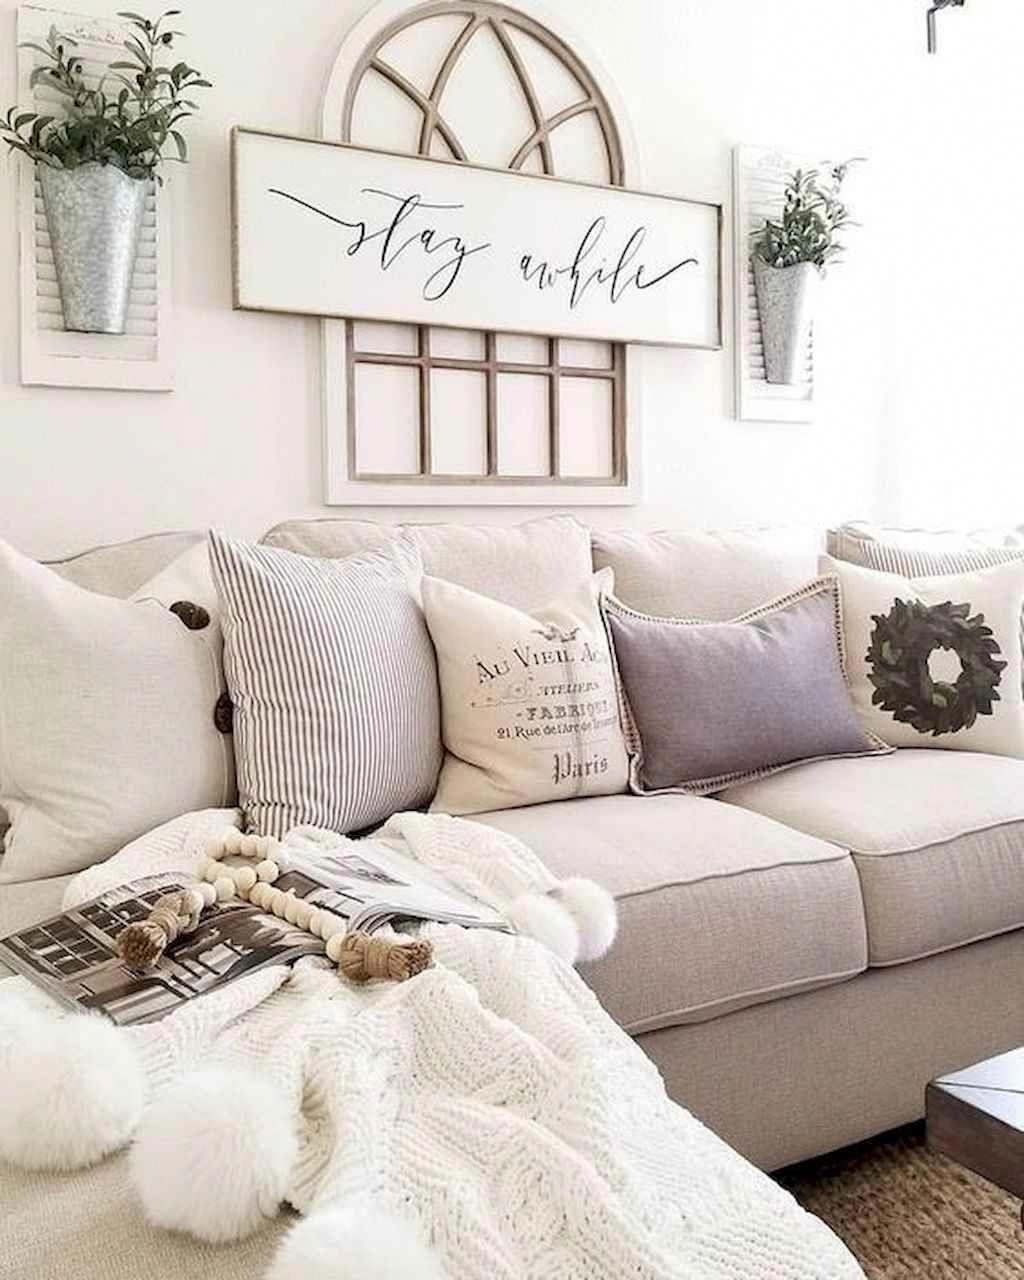 shabbychicideaslivingroom   Shabby chic living room, Chic living room, Chic living  room decor